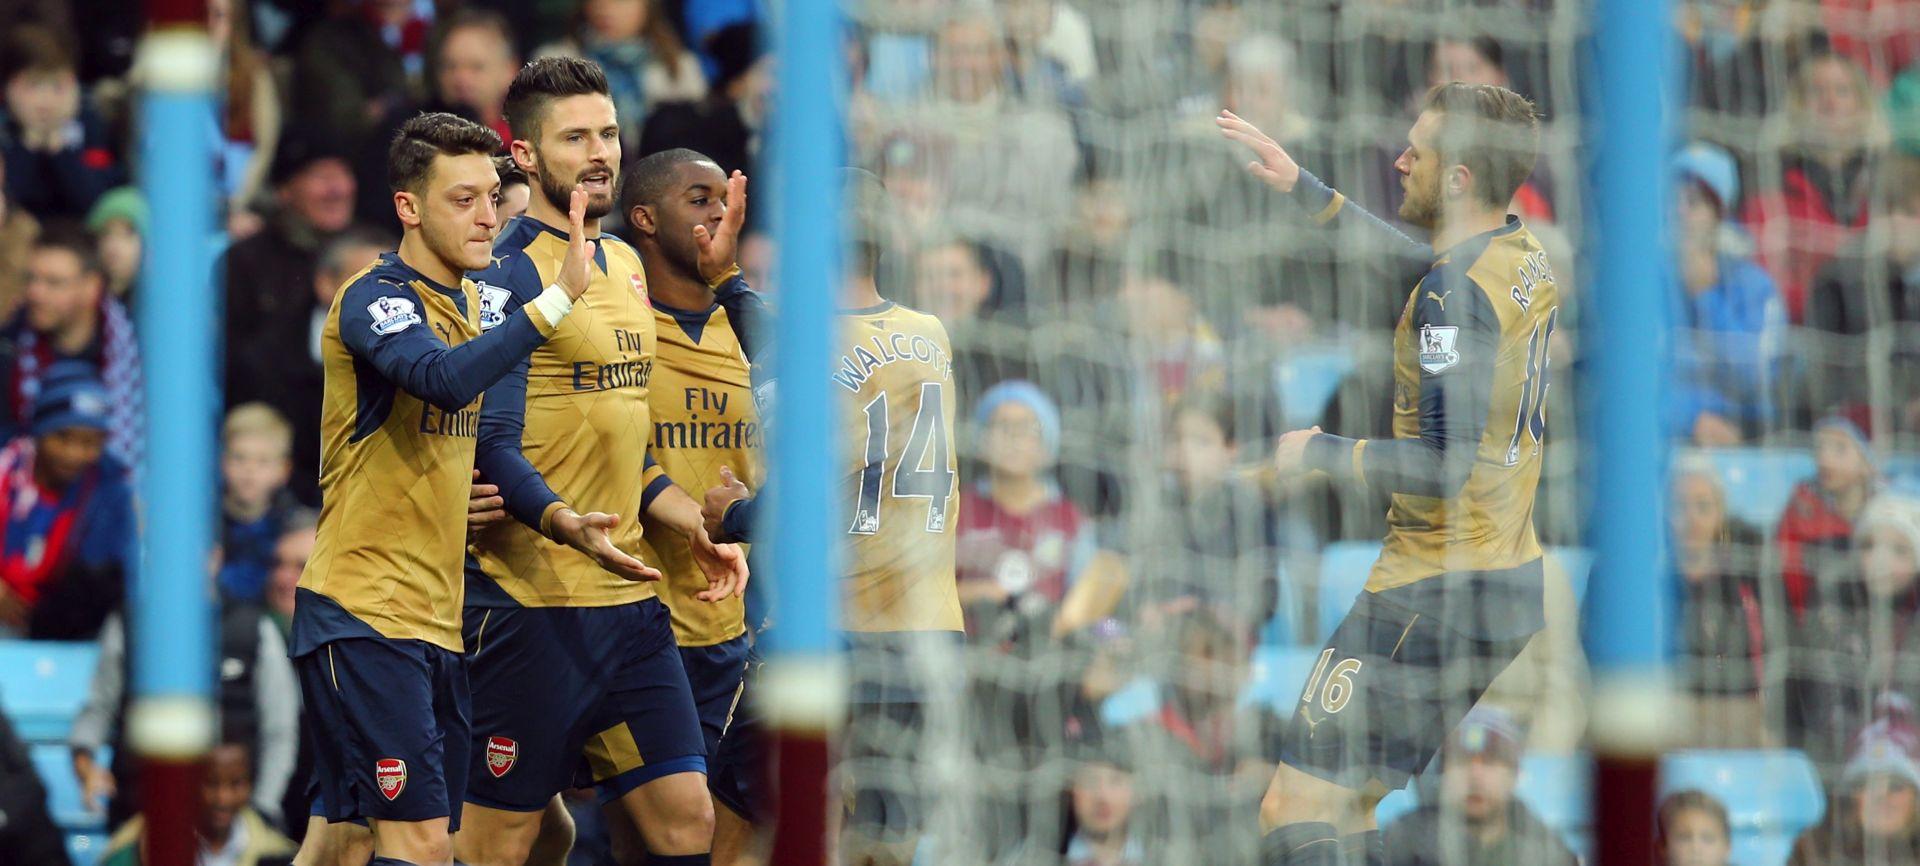 PREMIERSHIP Arsenal slavio protiv Ville, Giroud i Ramsey strijelci za vrh ljestvice